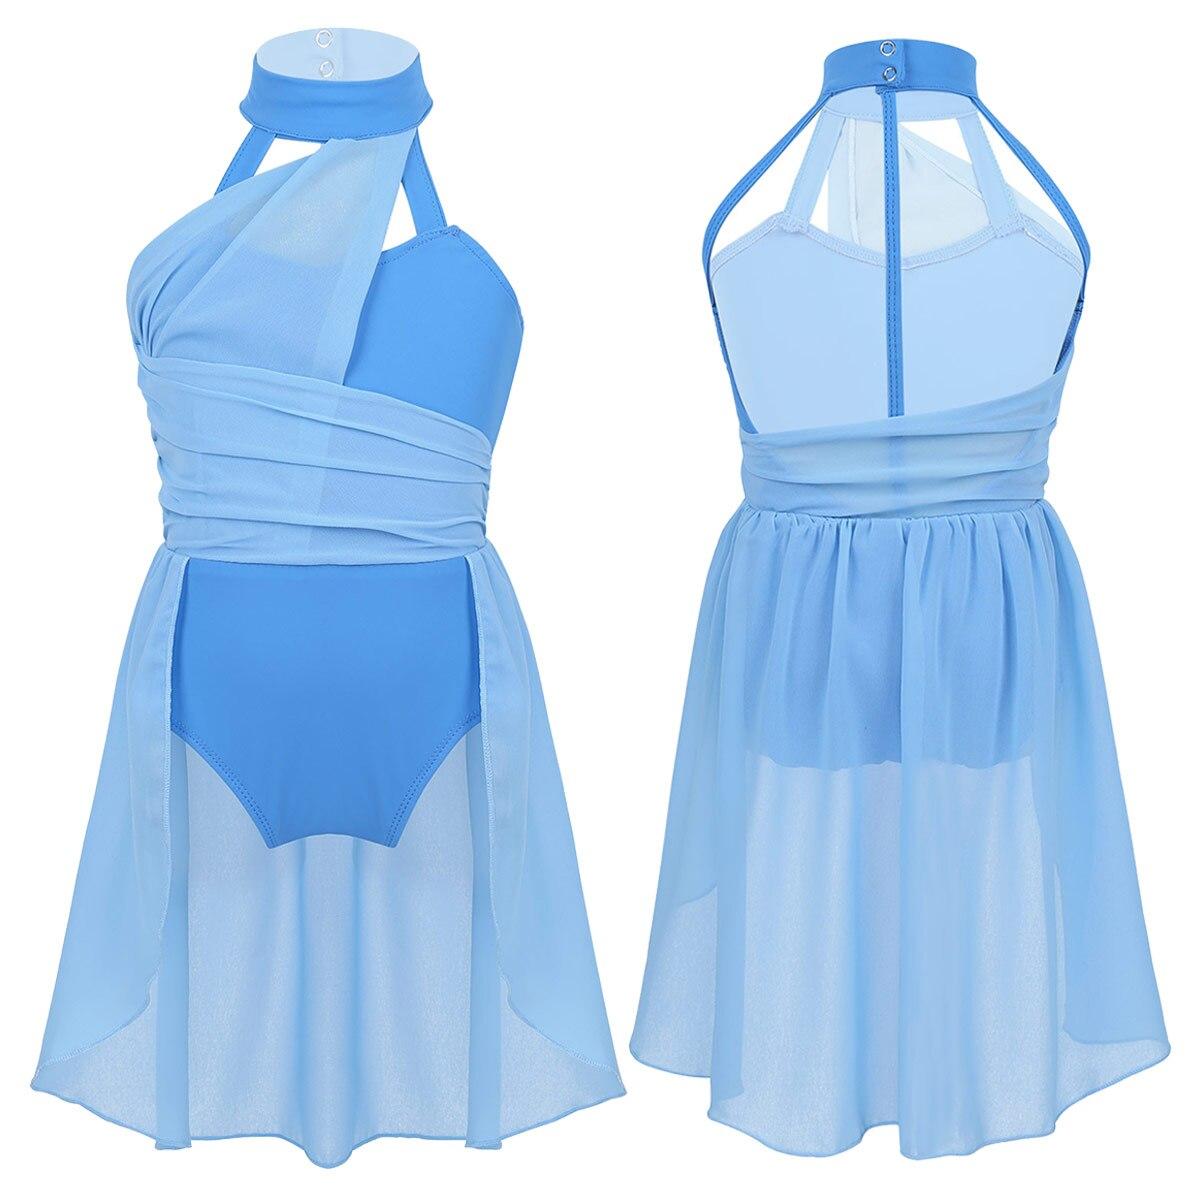 Kids Sleeveless Ruched Chiffon Bodice Caged Back Skating Modern Ballet Dance Dress Contemporary Girls Lyrical Dance Costumes